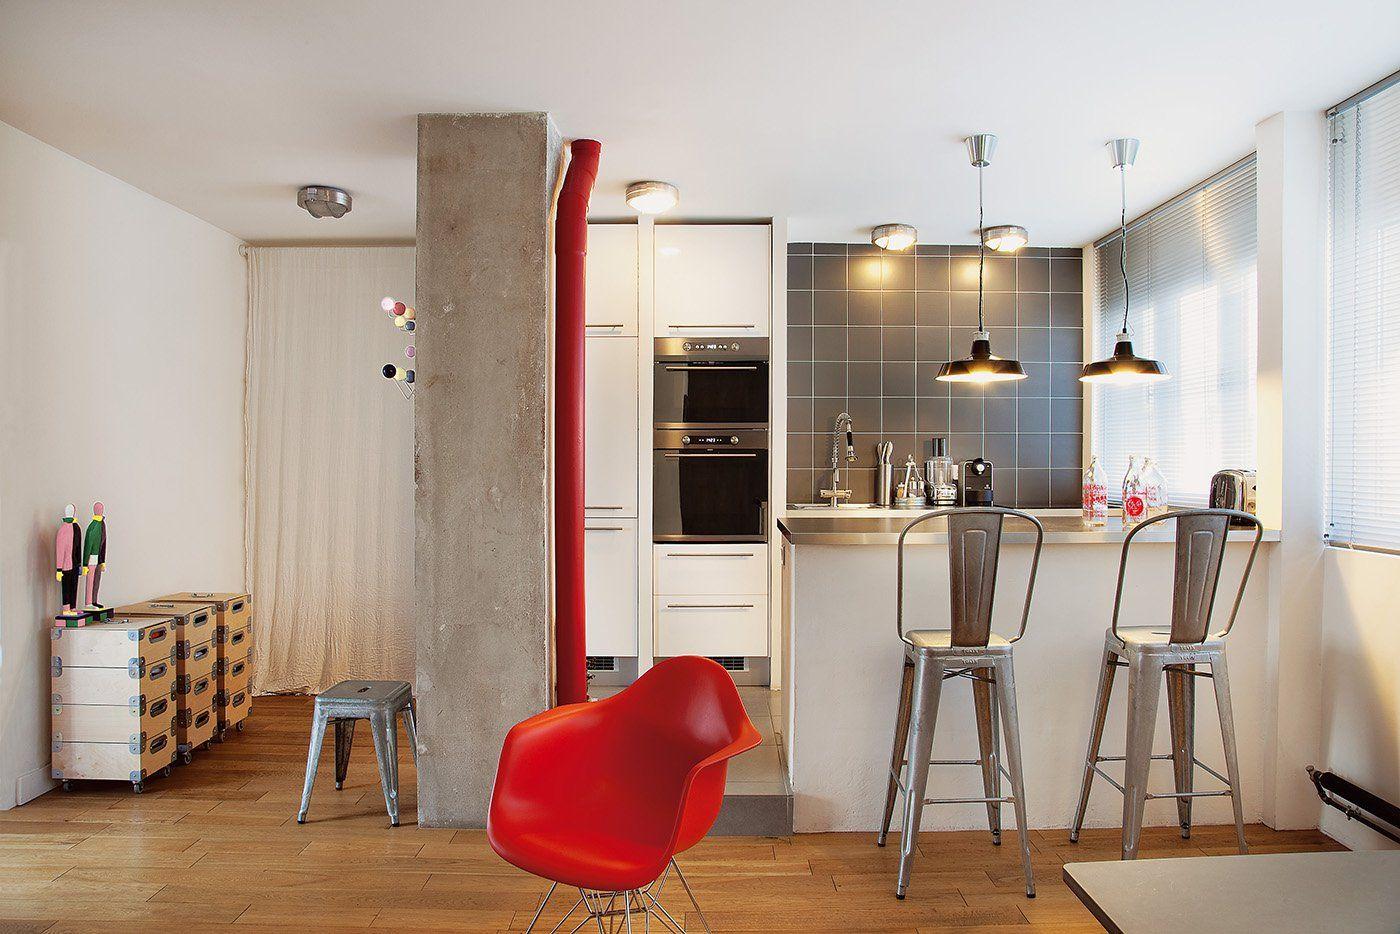 Однокомнатная квартира лофт с кухней